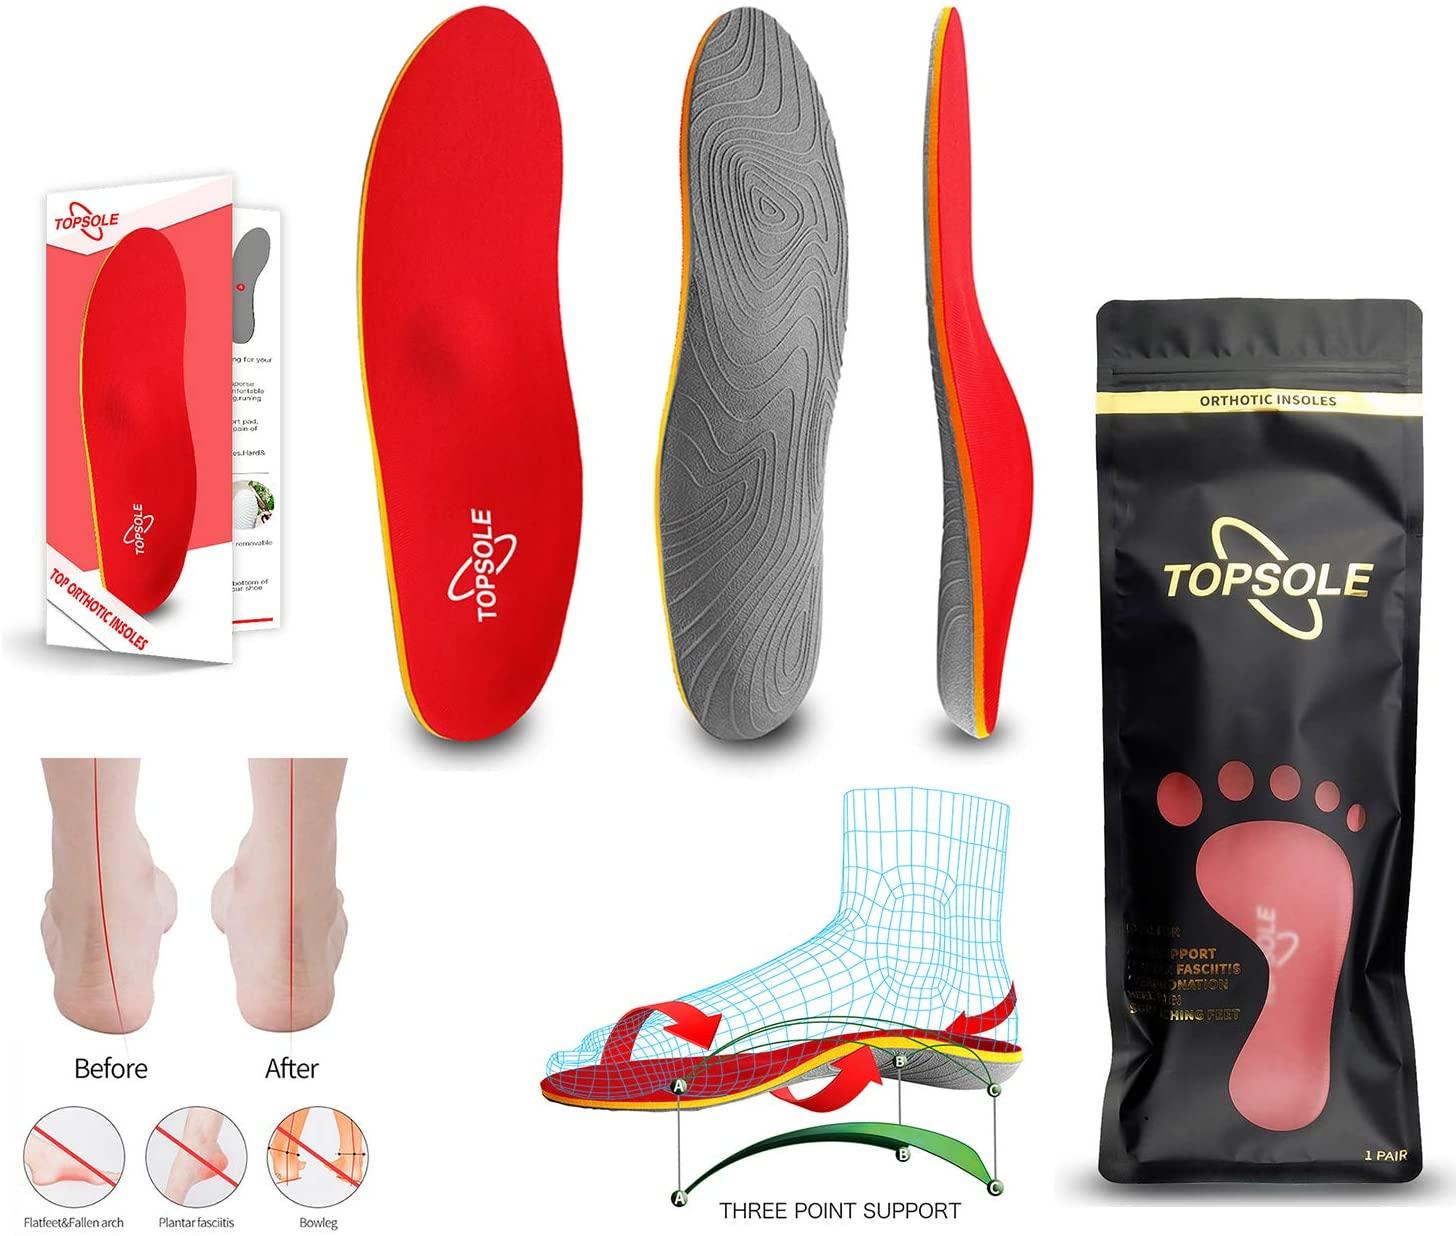 Topsole Flat Feet Metatarsal Orthotic Insoles Arch Support Full Length Inserts Metatarsal Pinnacle Plus for Metatarsalgia, Plantar Fasciitis, Heel Pain, Big Toe, Pain Forefoot Pain …